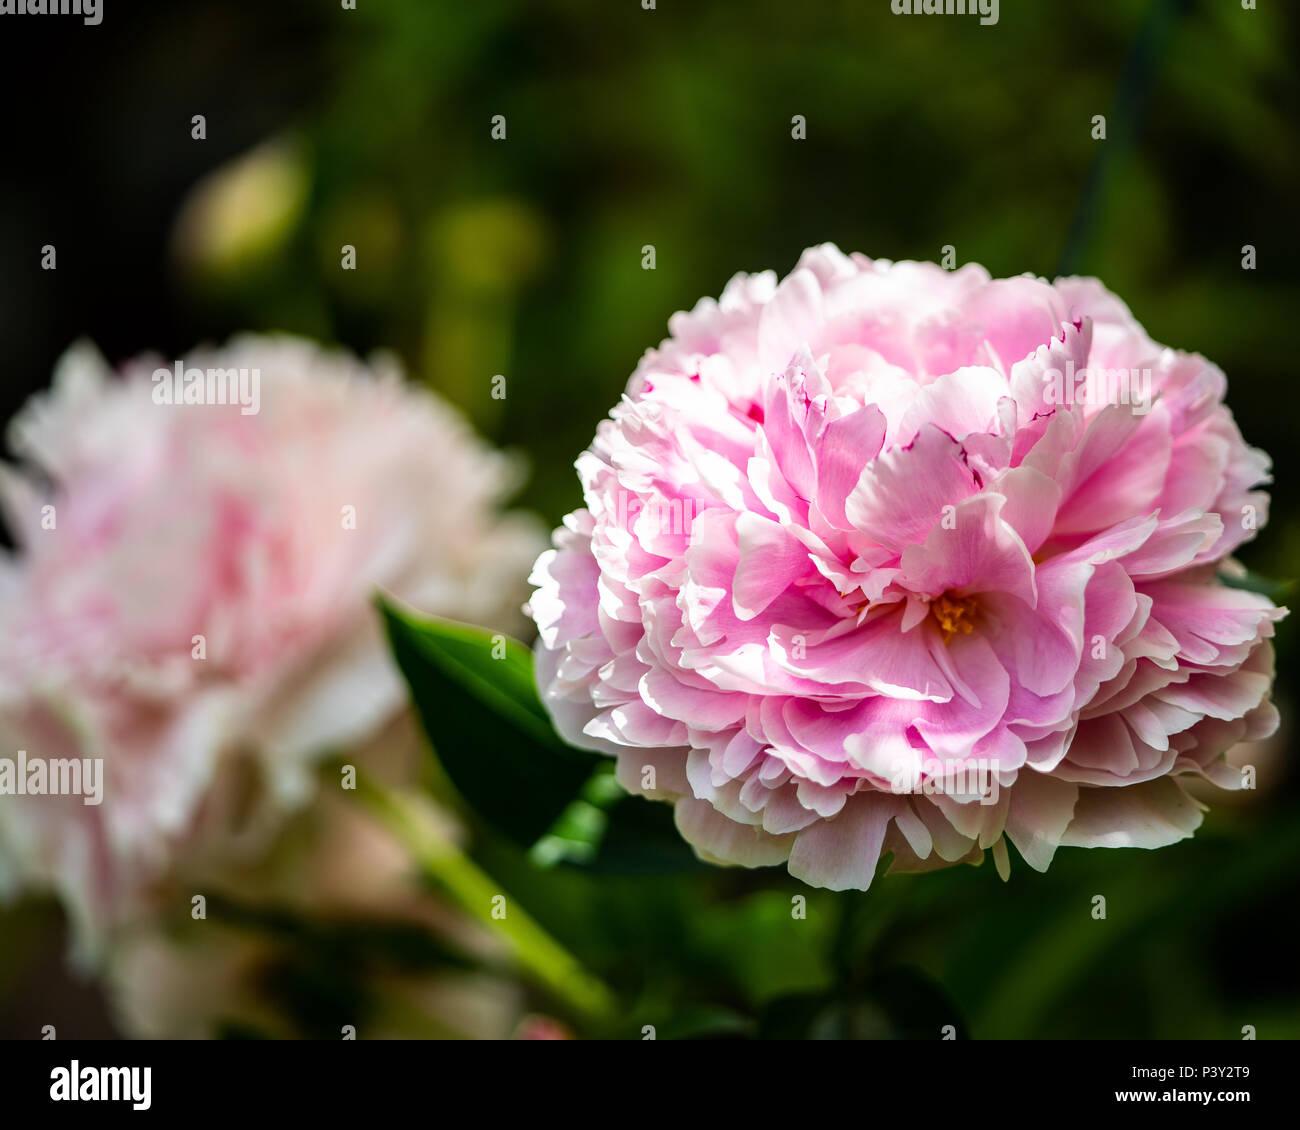 Beautiful pink flower  - Stock Image